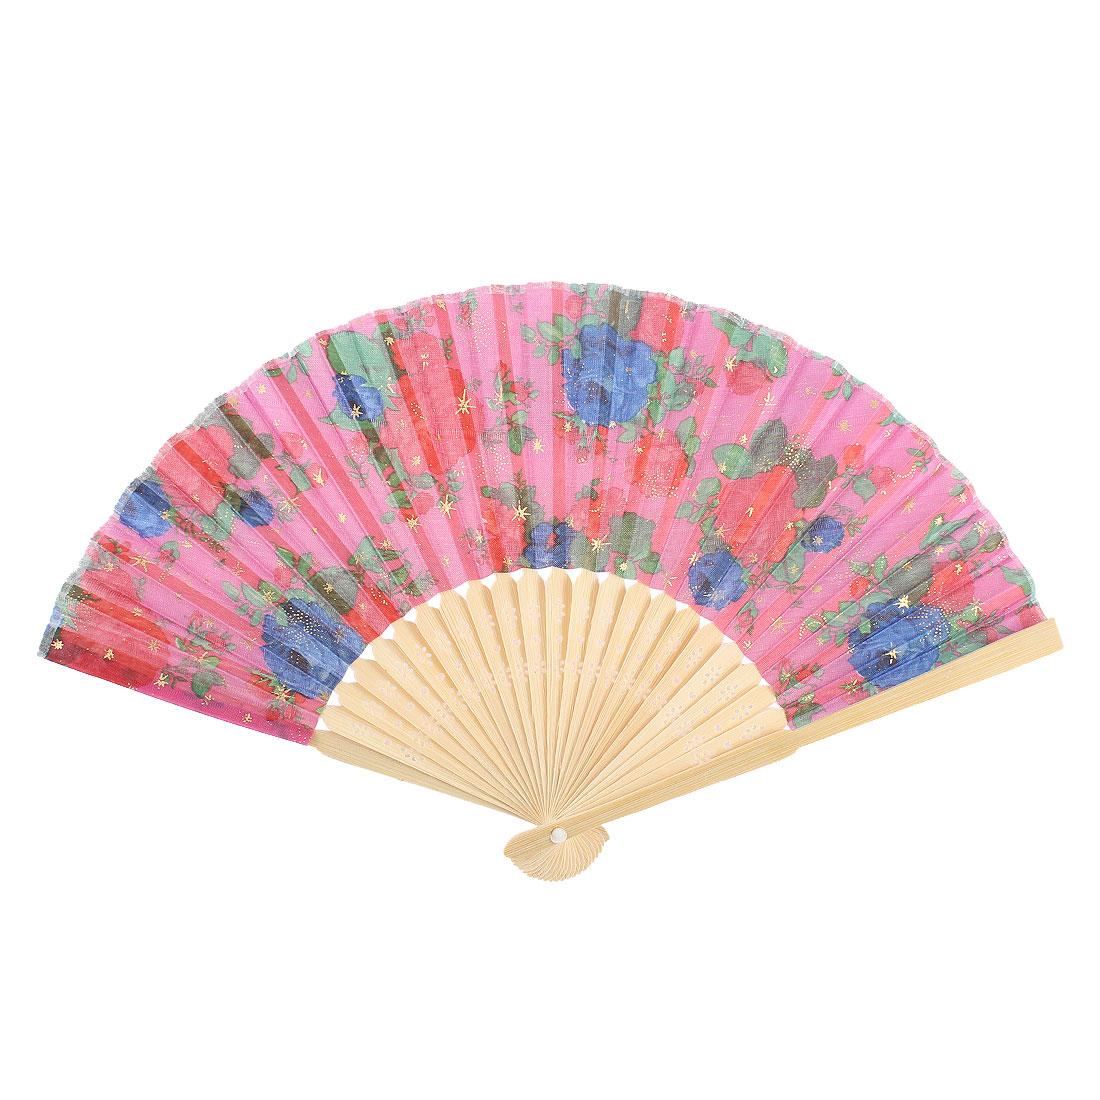 Booming Flower Pattern Wood Rib Foldable Summer Hand Fan Fuchsia Beige